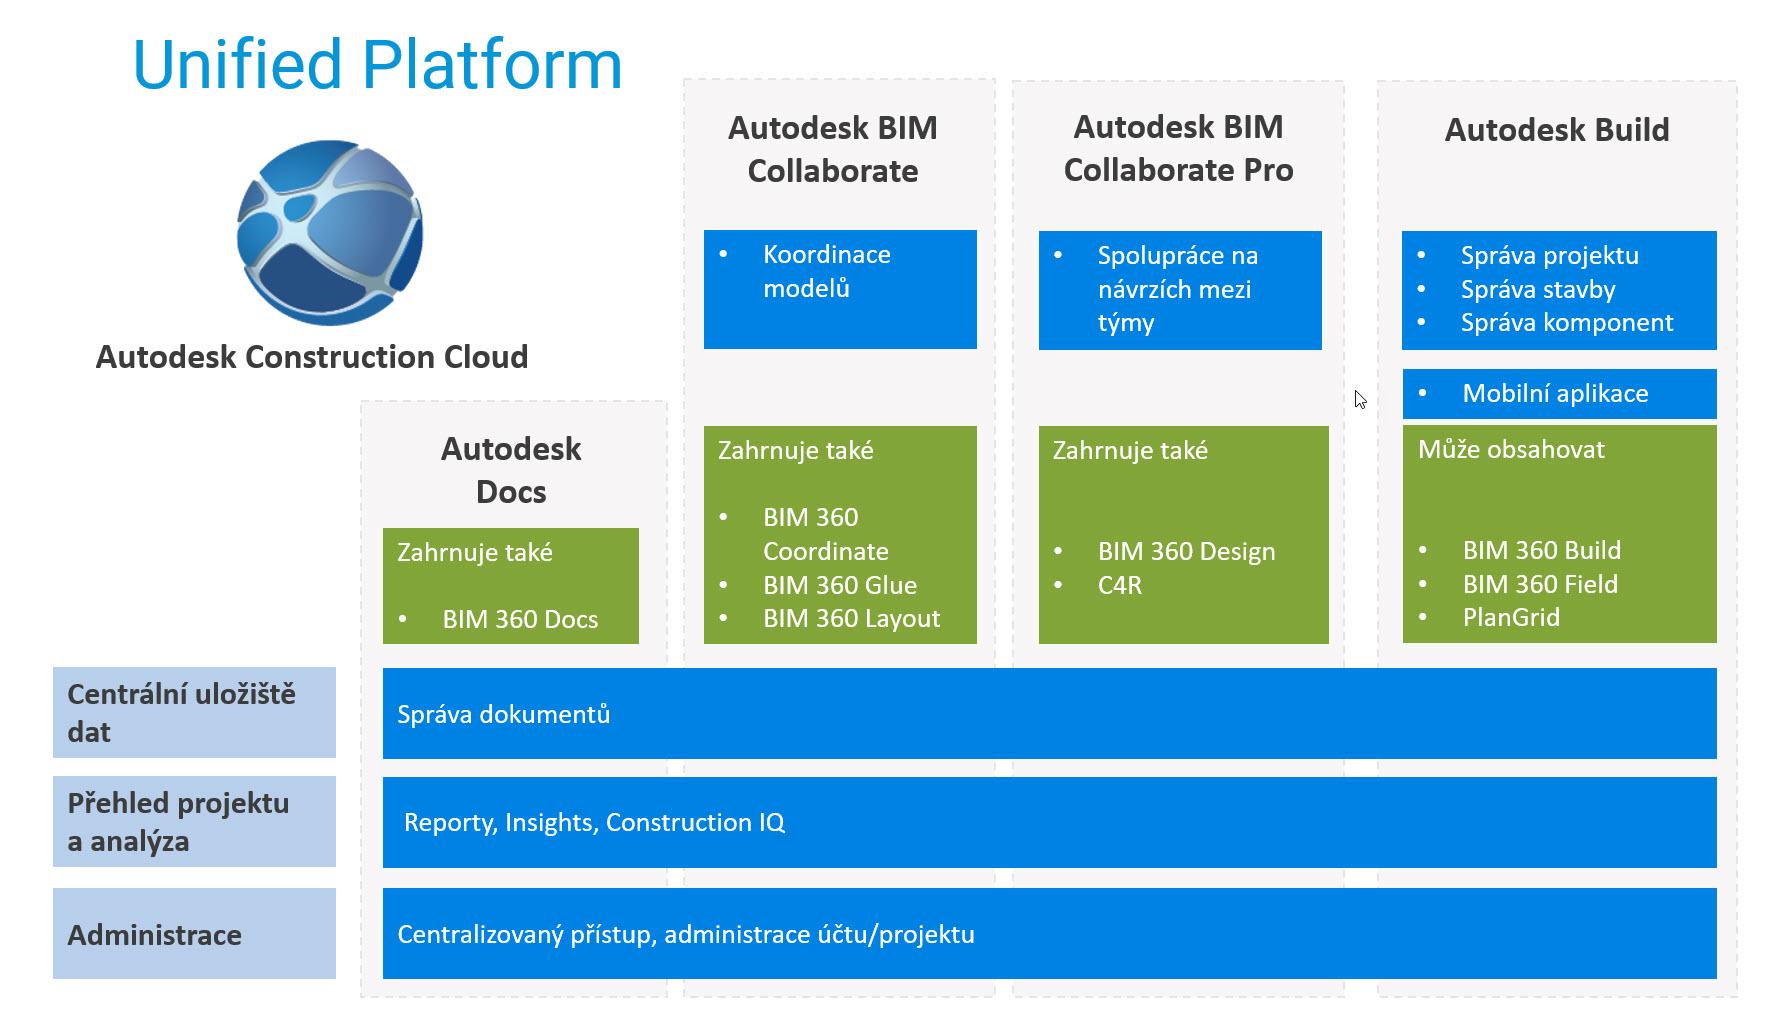 Sjednocená platforma Autodesk Construction Cloud